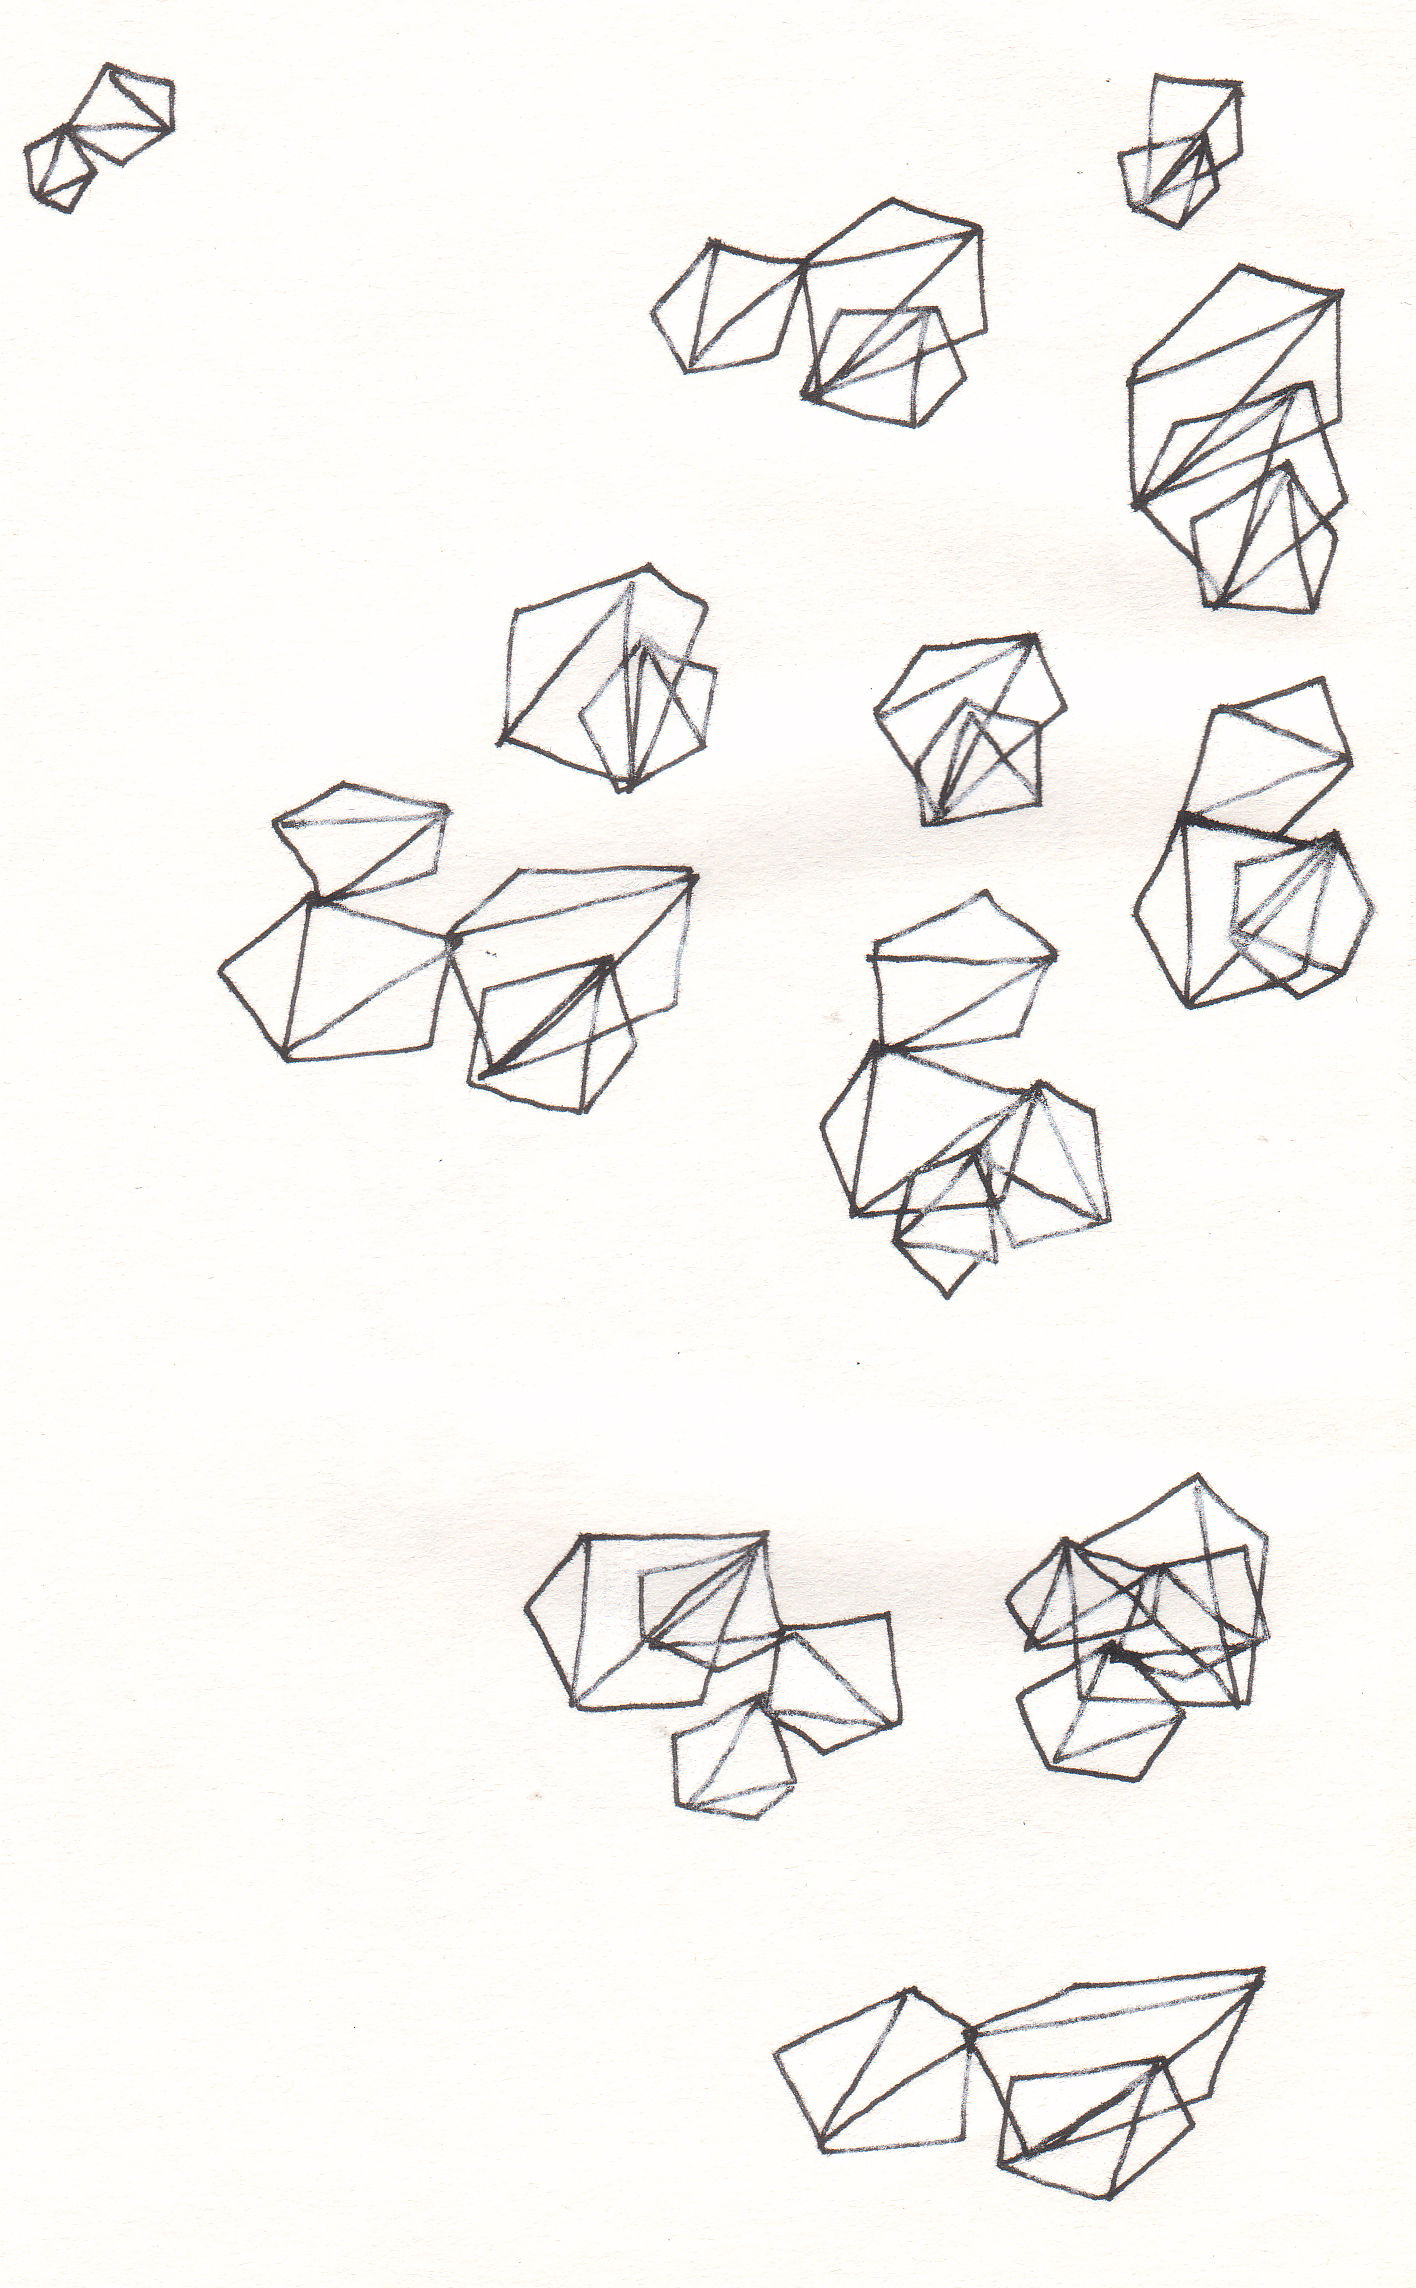 differentialPyramids